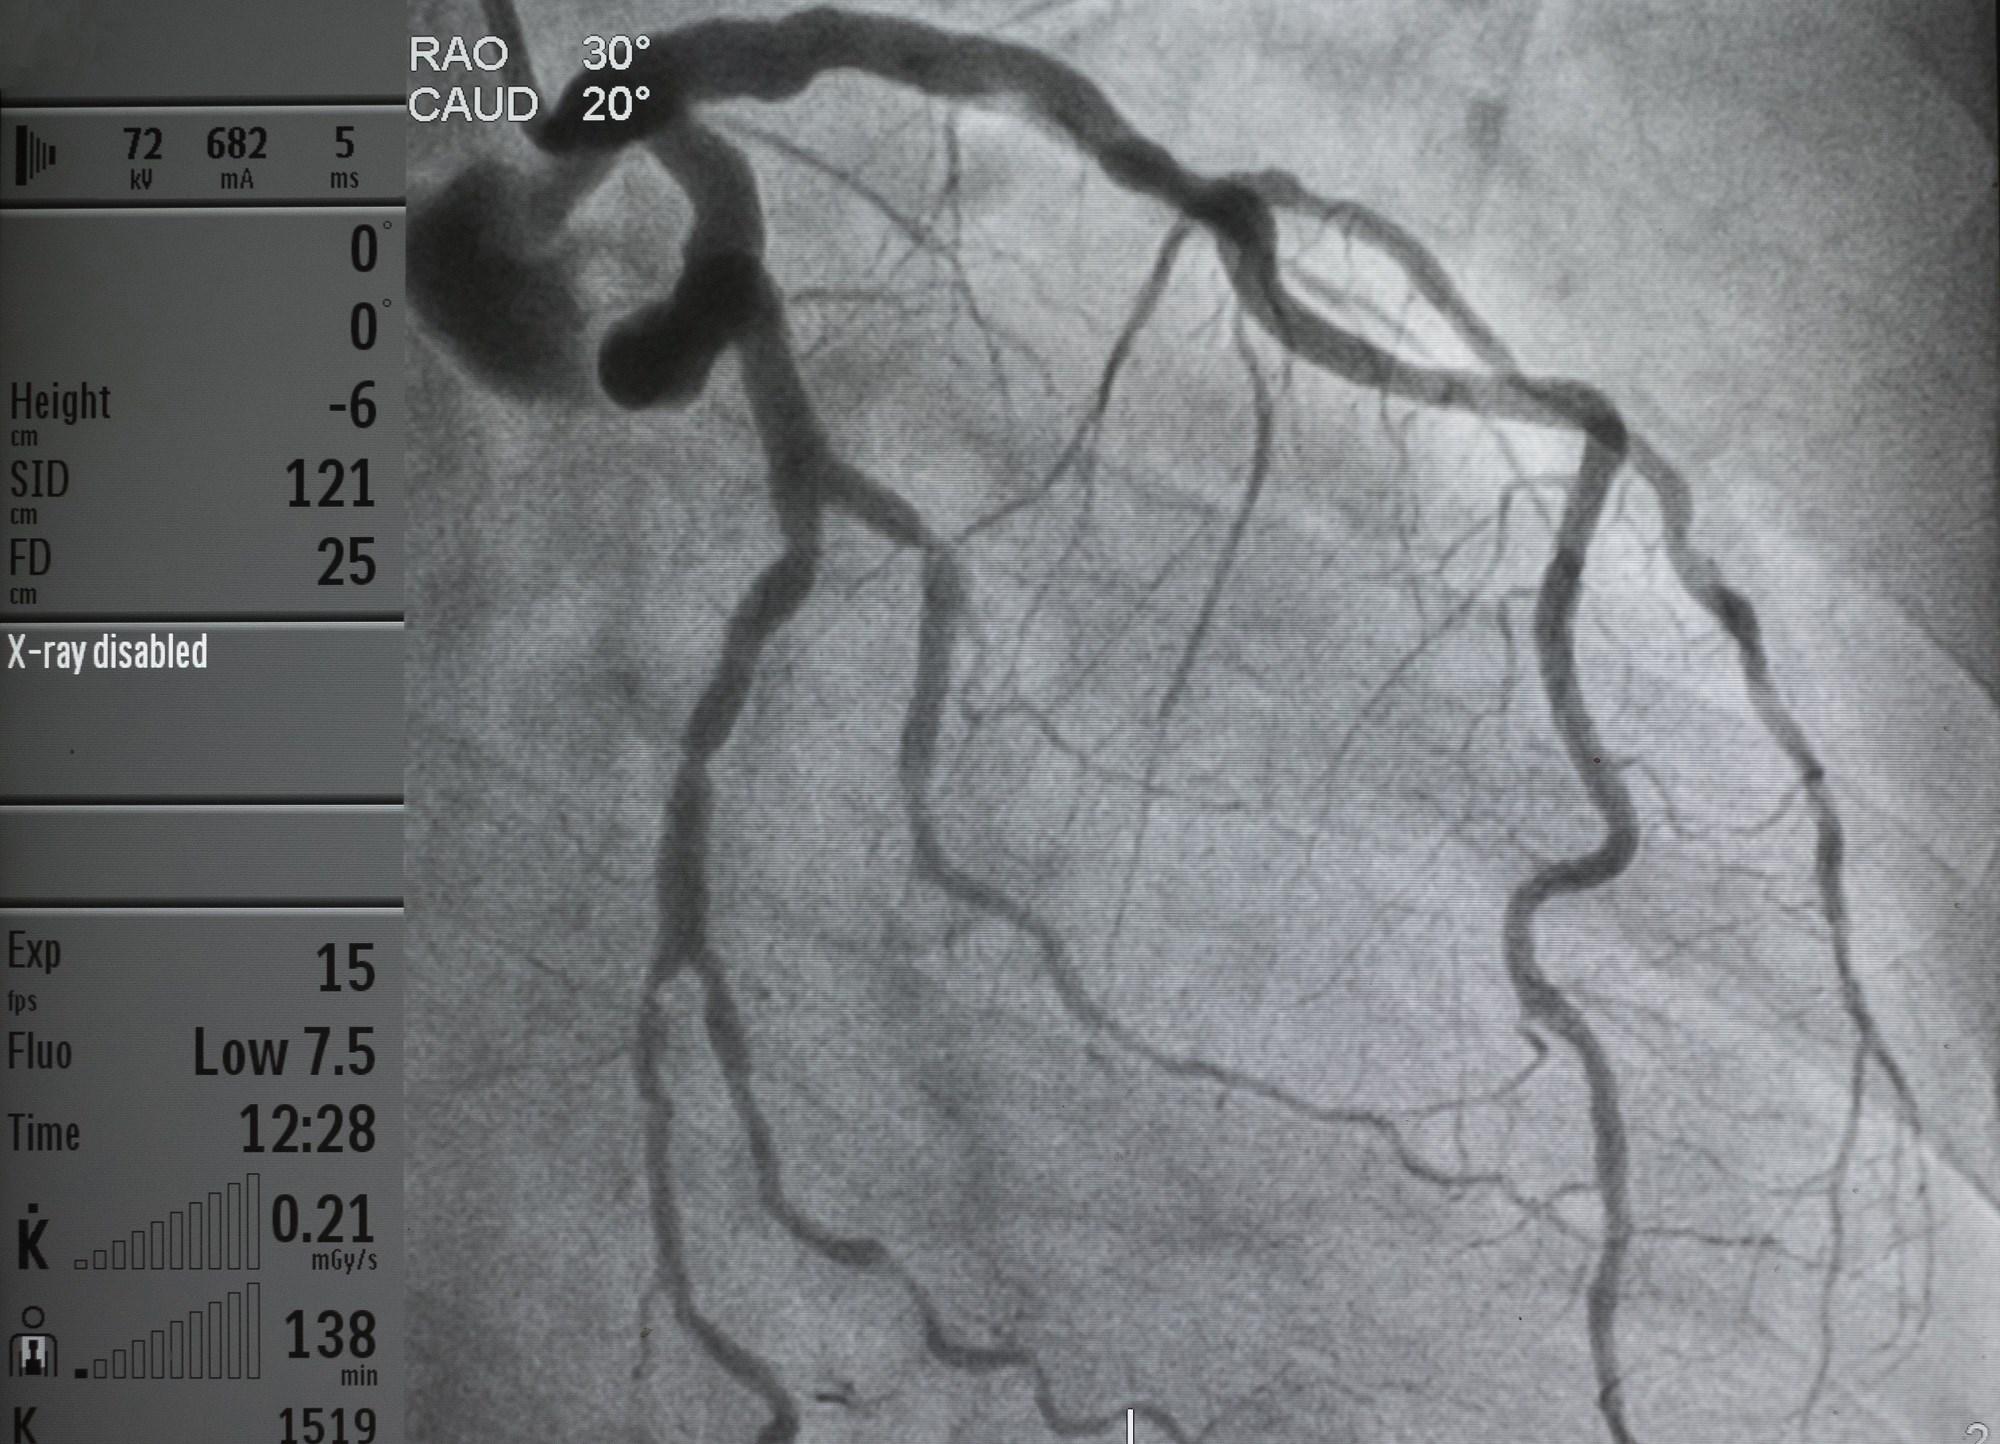 Intracoronary Nicardipine Effectively Reverses Spontaneous Coronary Slow-Flow